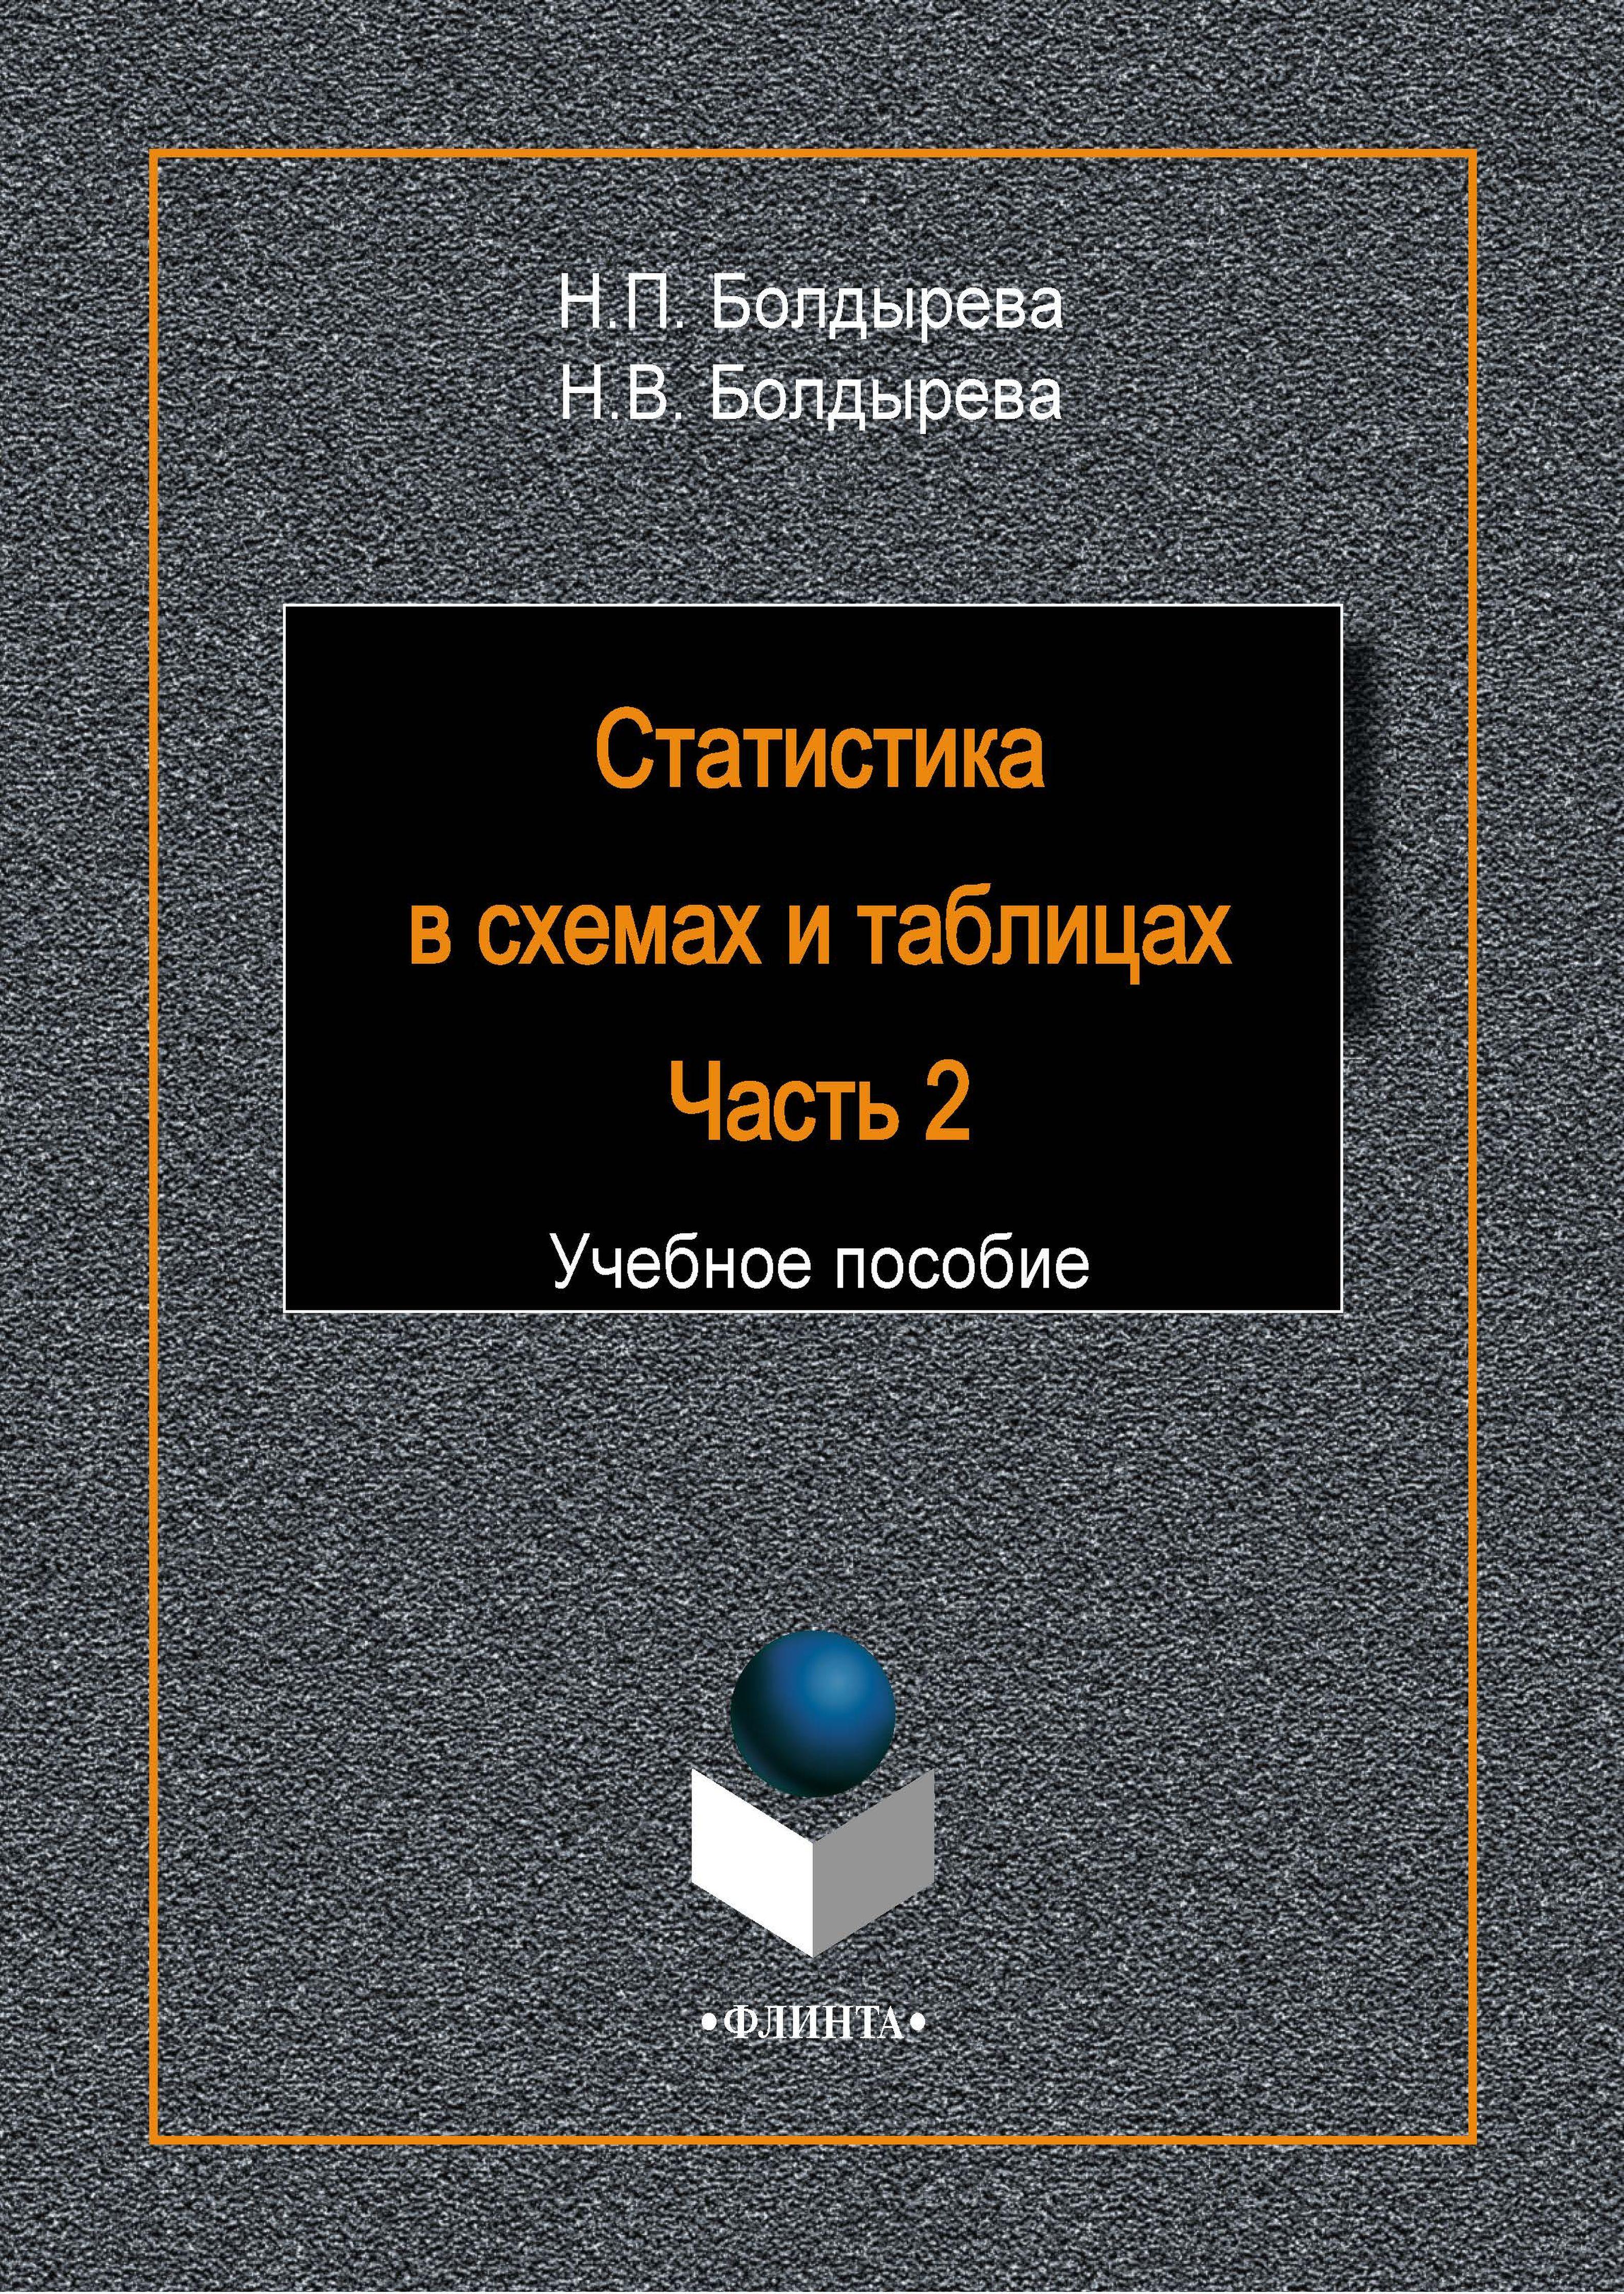 Н. П. Болдырева Статистика в схемах и таблицах. Часть 2